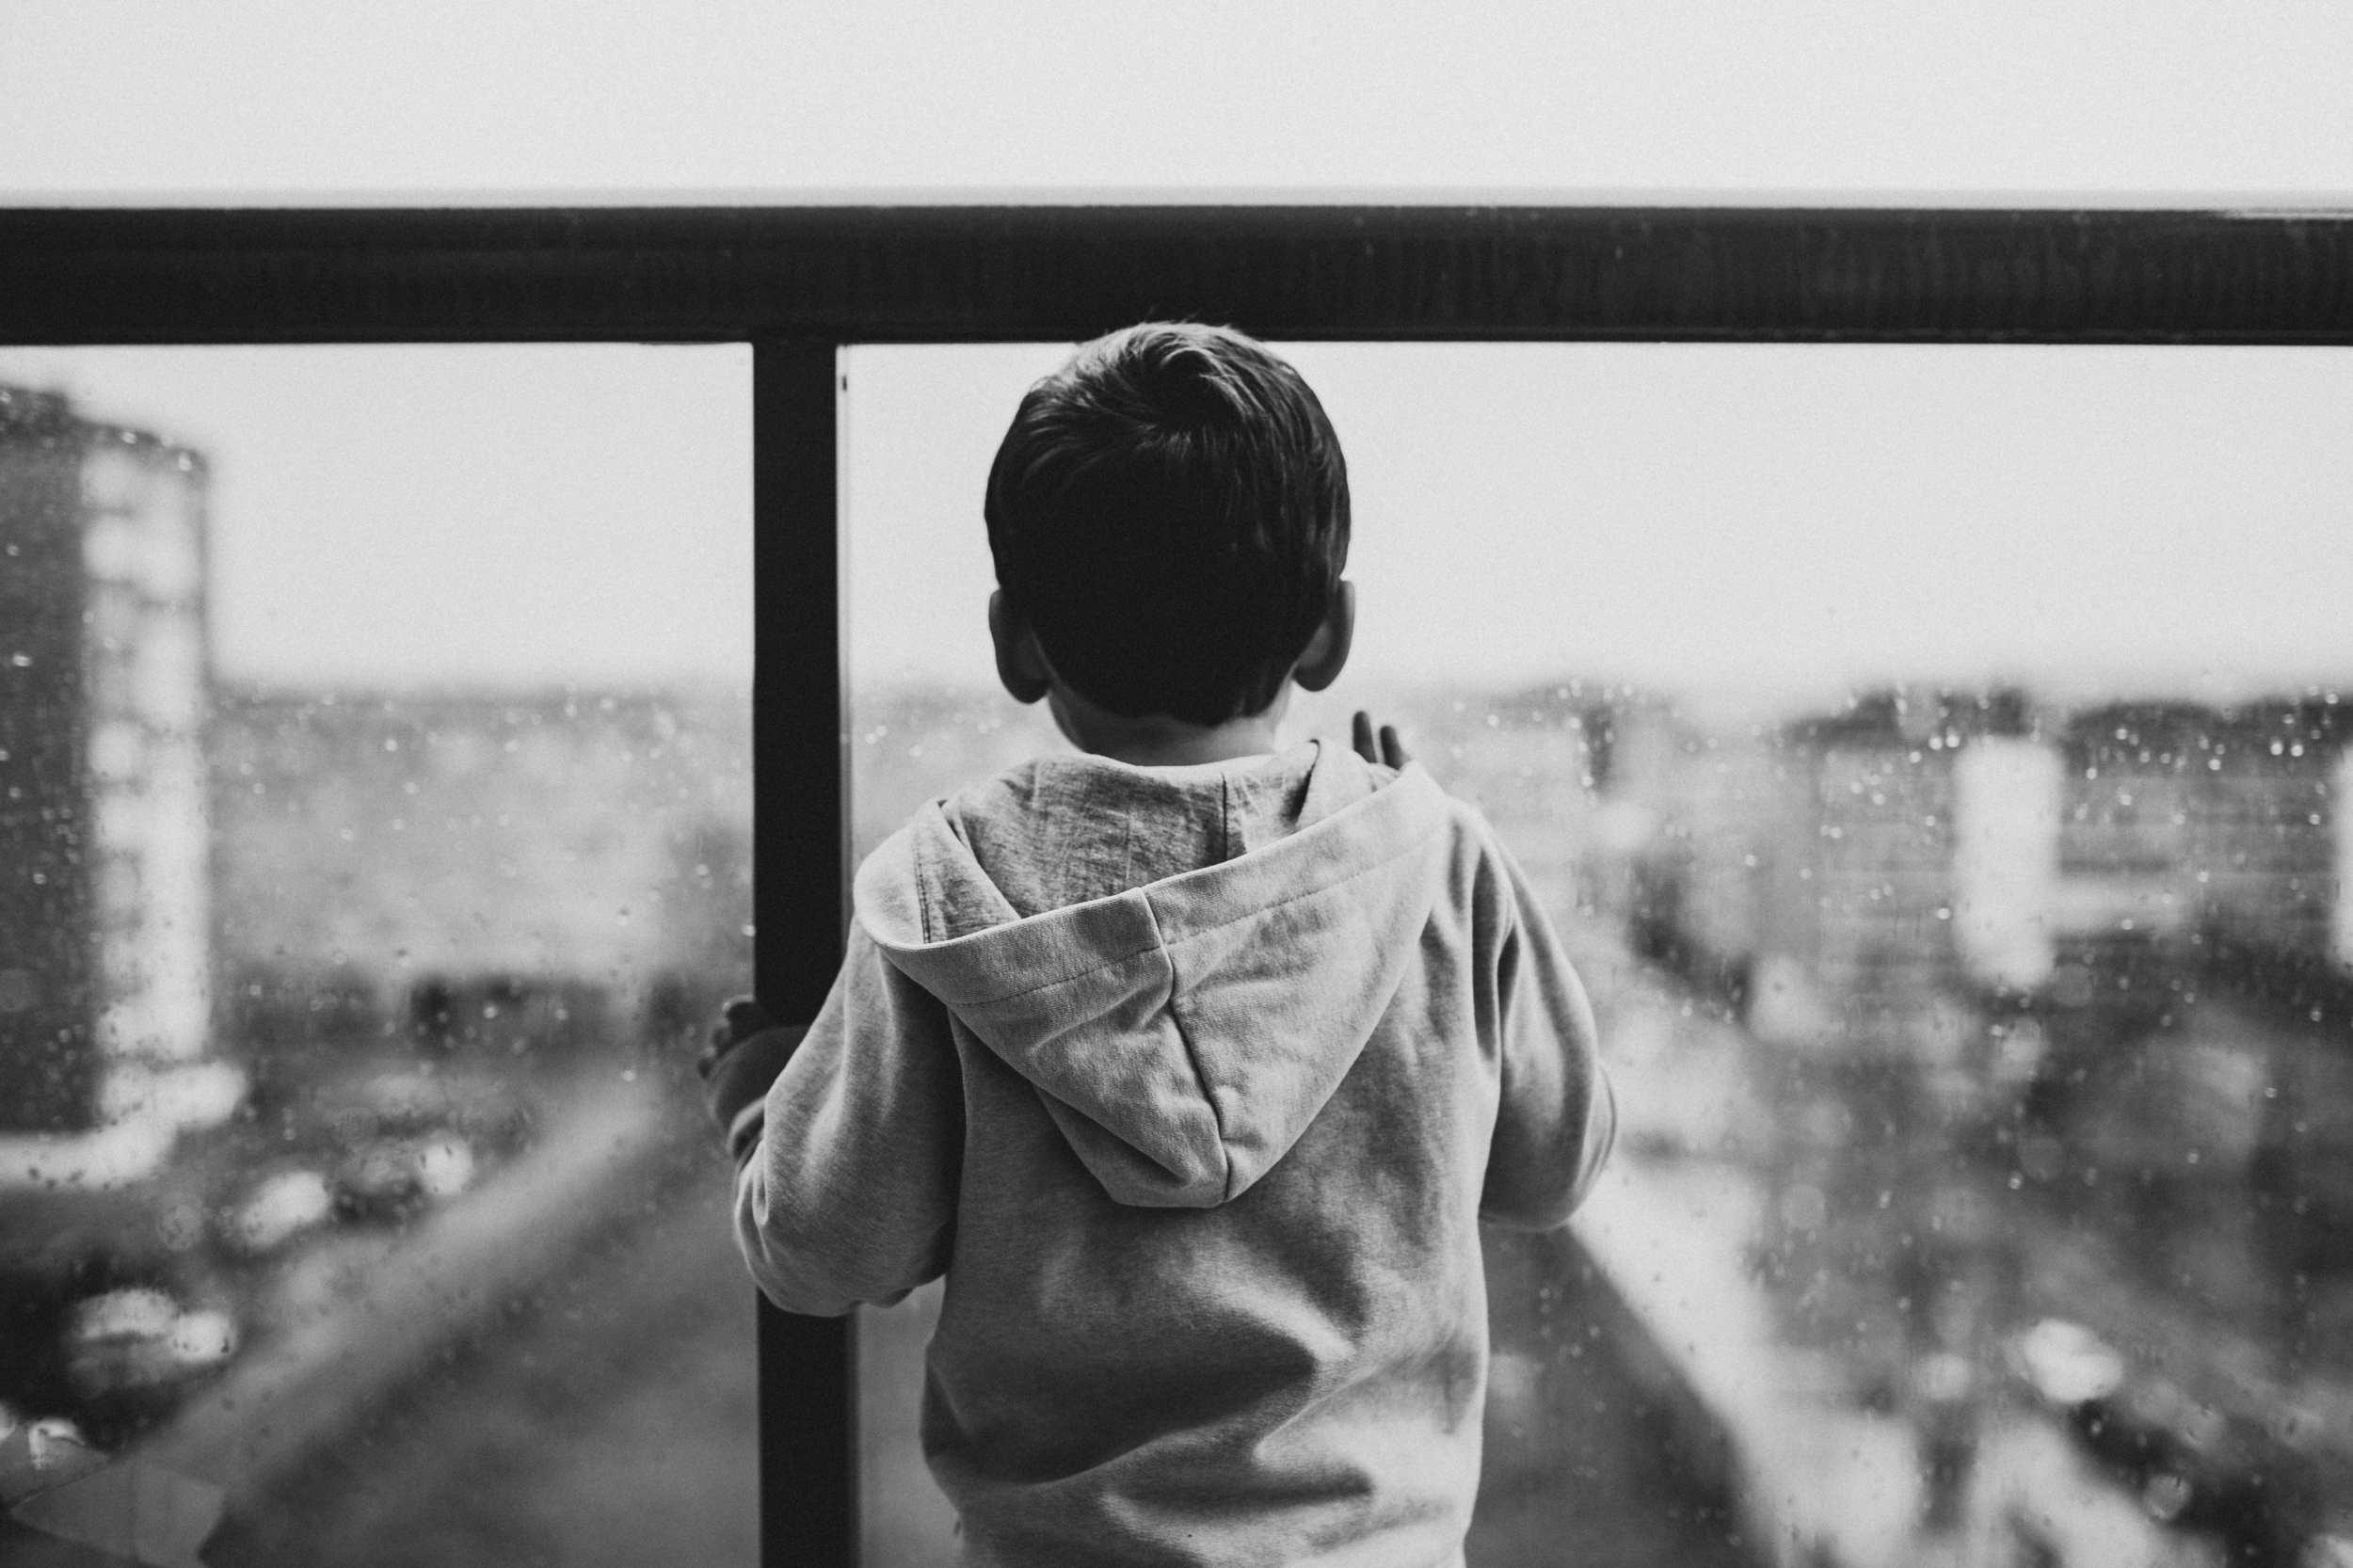 back-view-black-and-white-boy-827993b.jpg